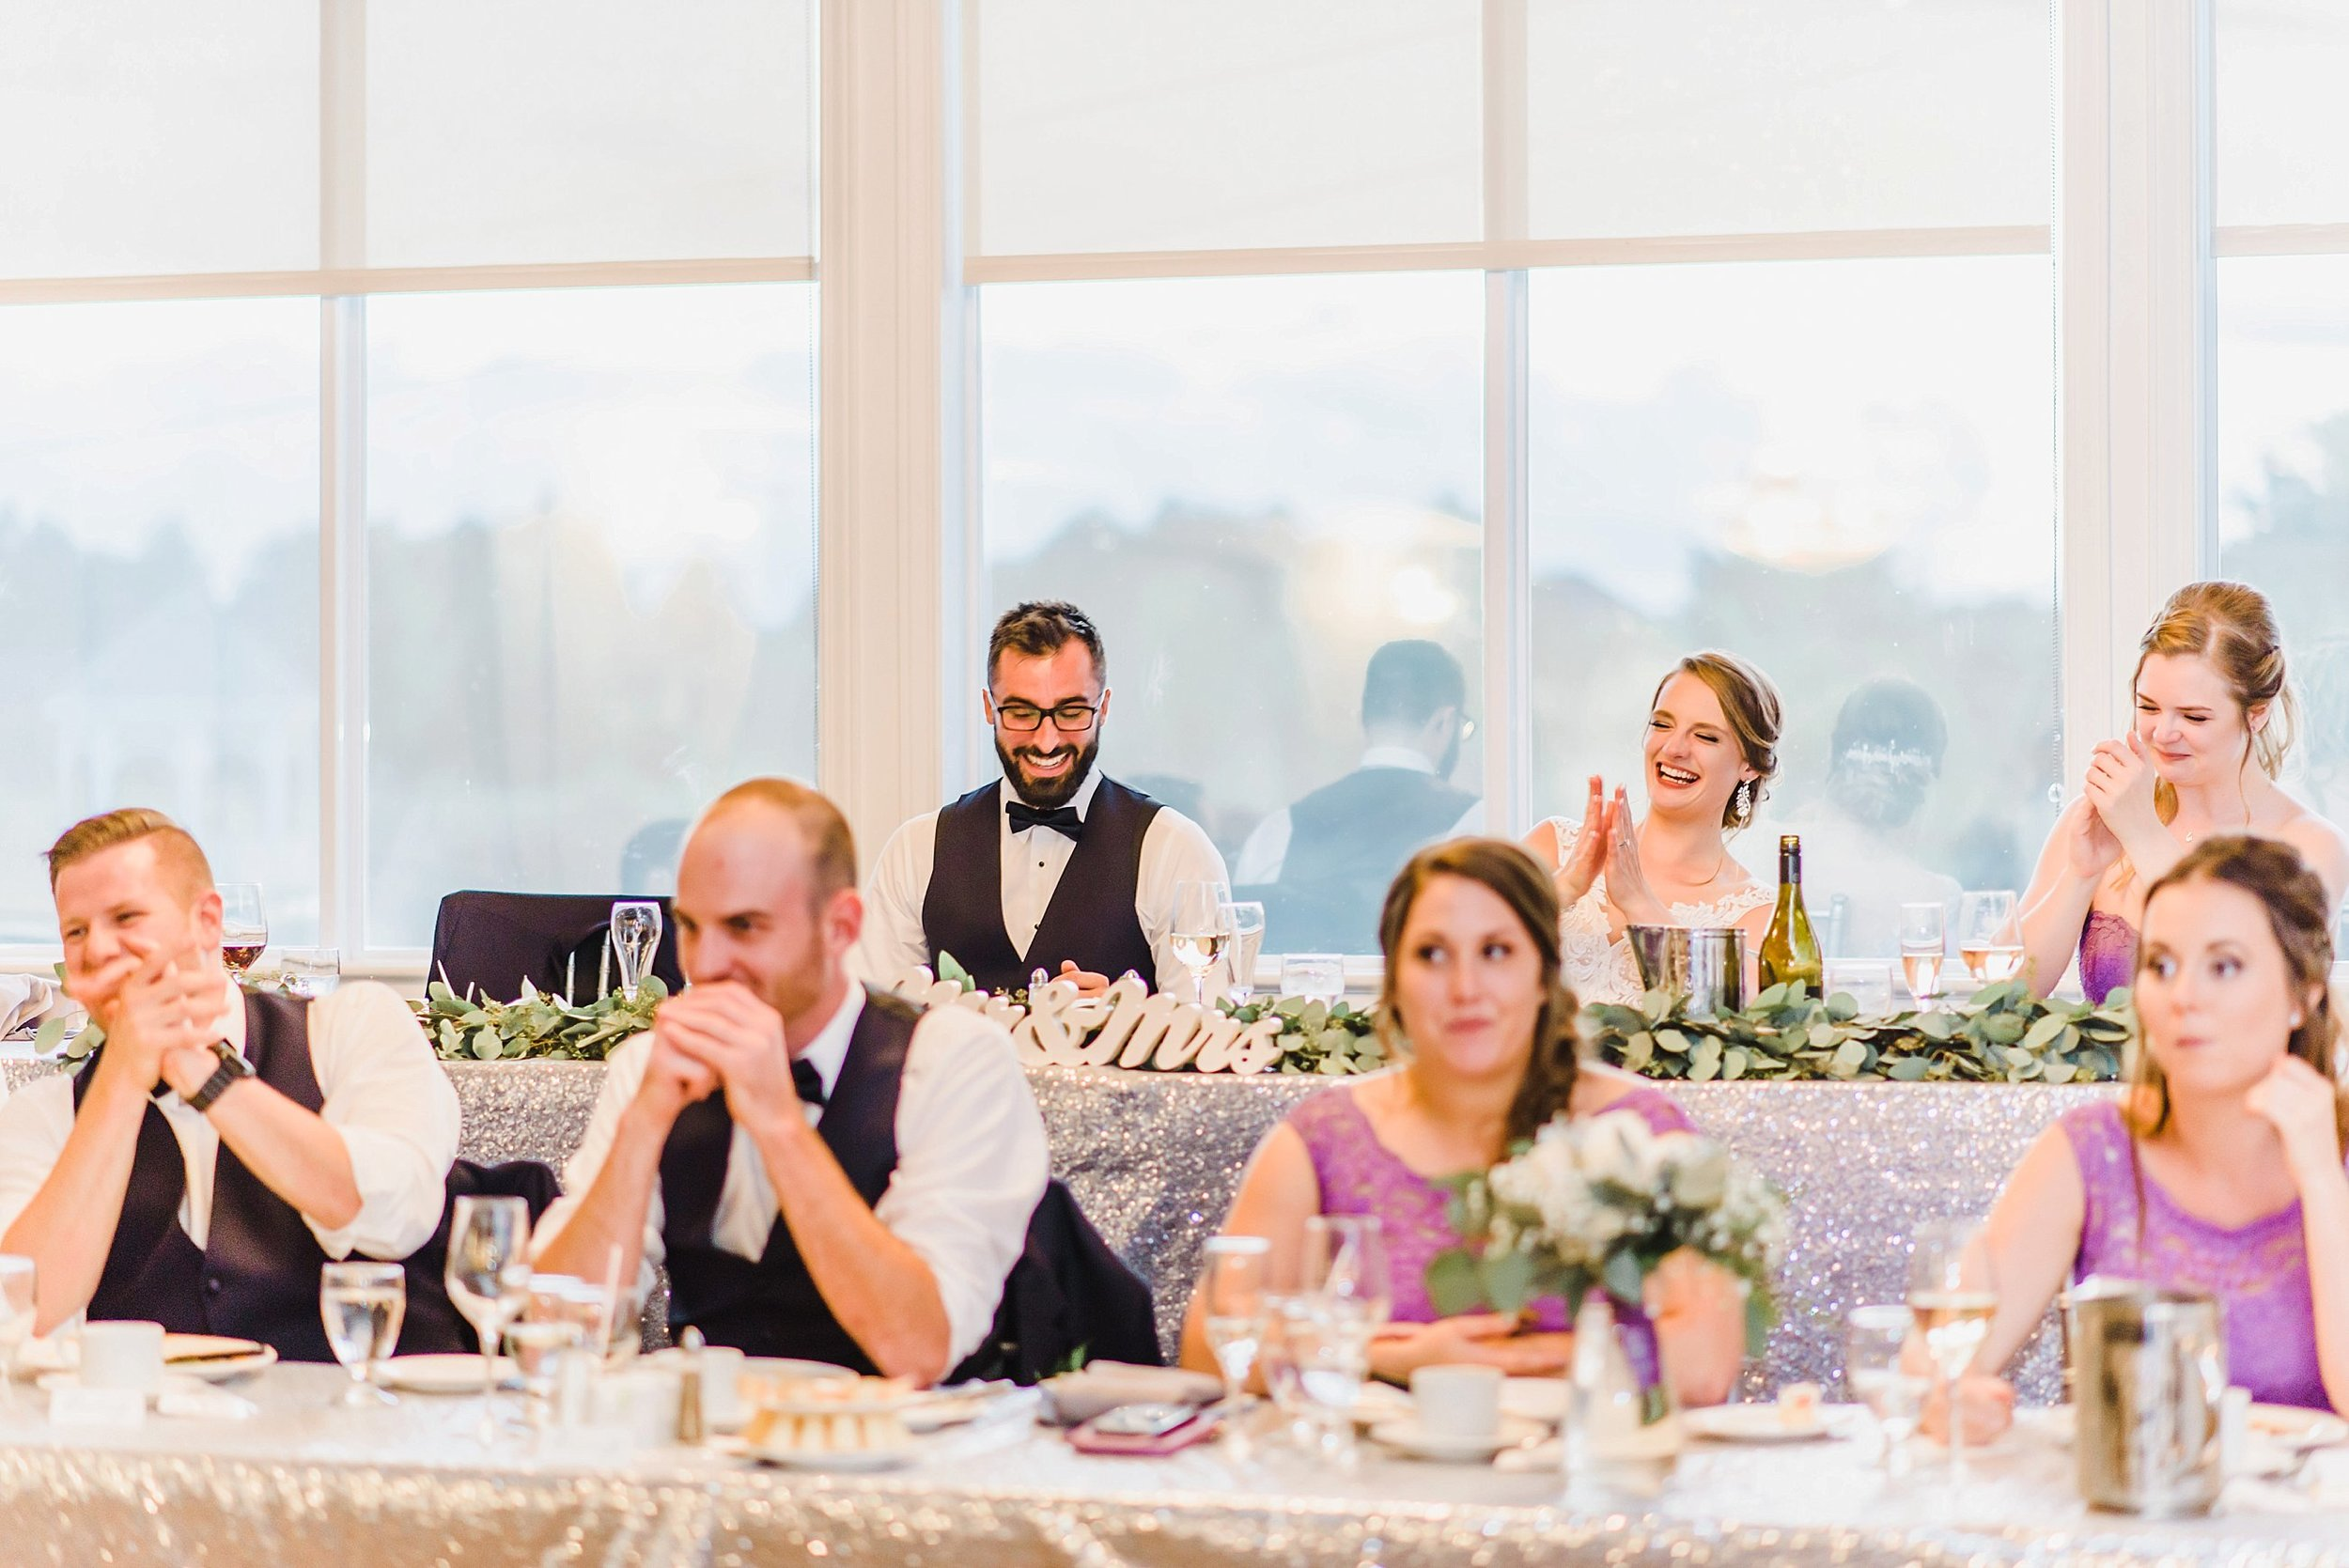 light airy indie fine art ottawa wedding photographer | Ali and Batoul Photography_1359.jpg